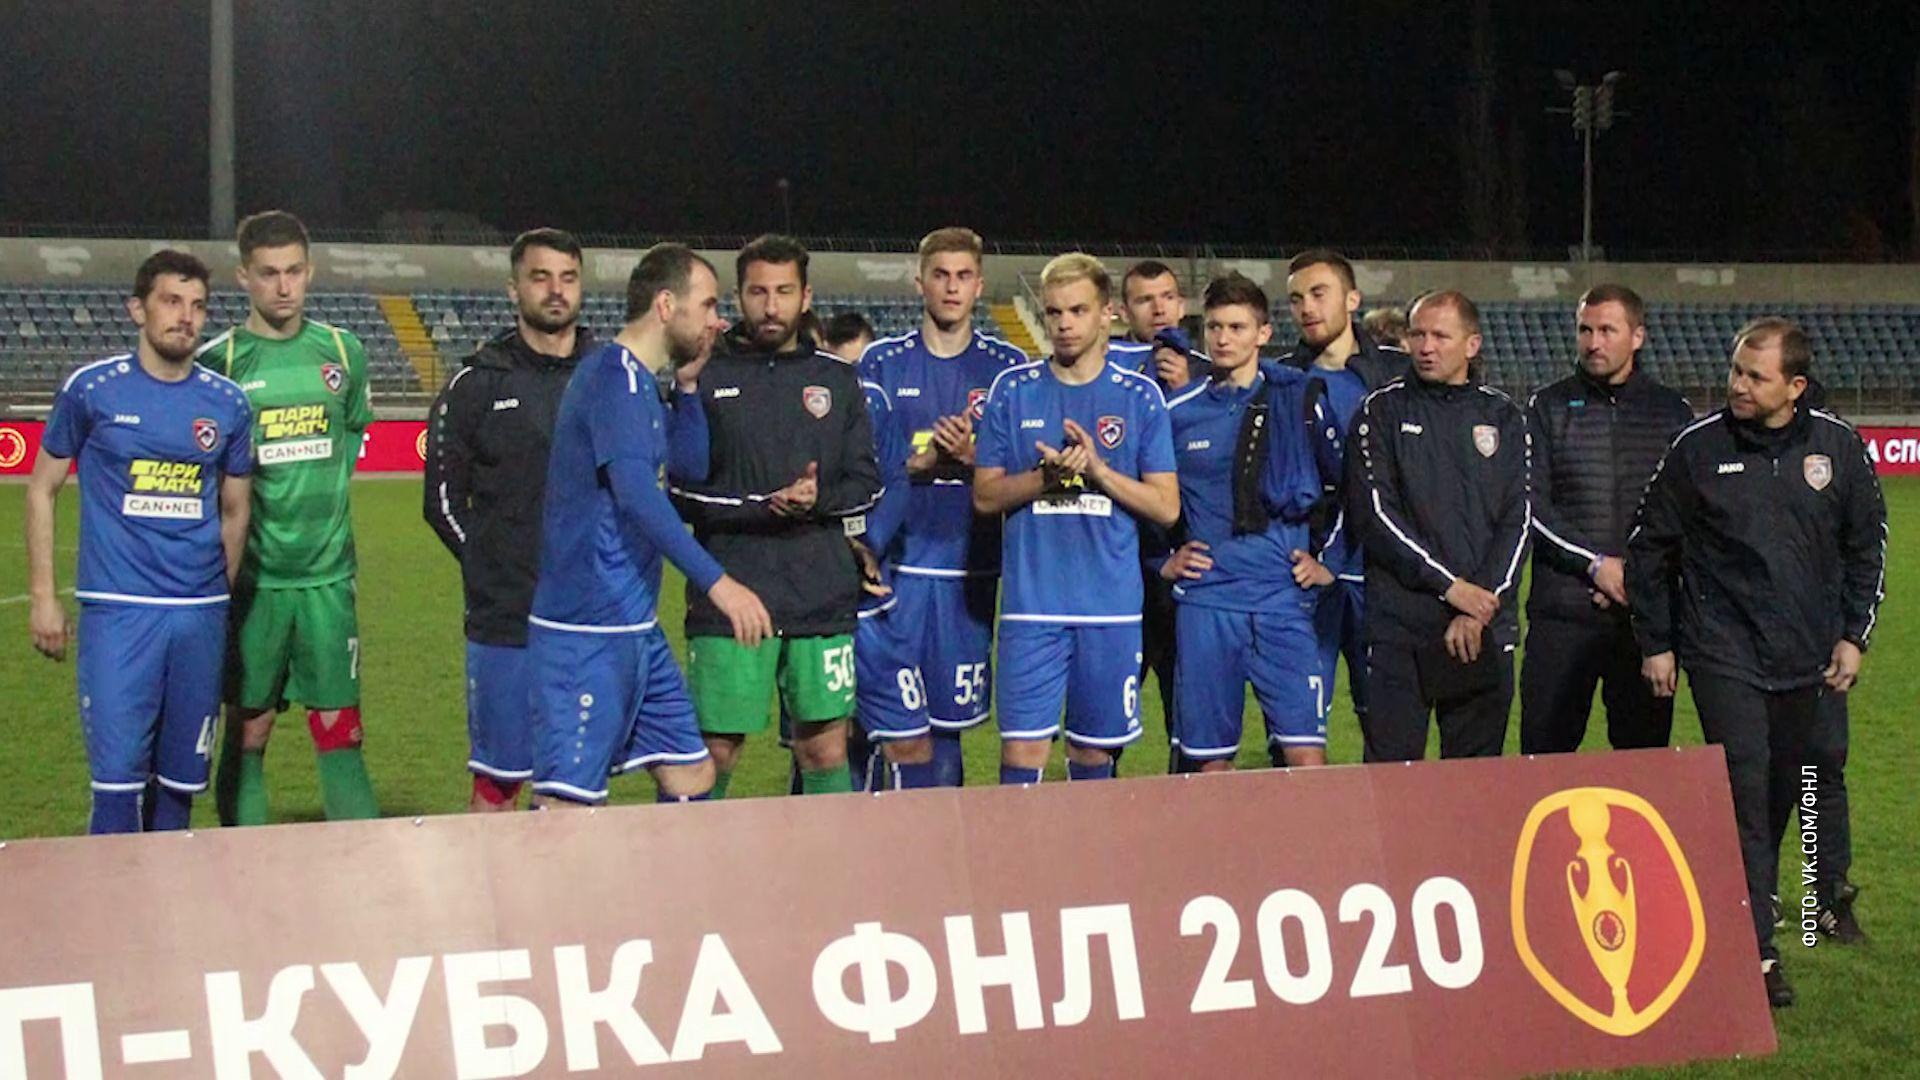 Три футболиста «Шинника» сыграли в финале Кубка ФНЛ за «Тамбов»